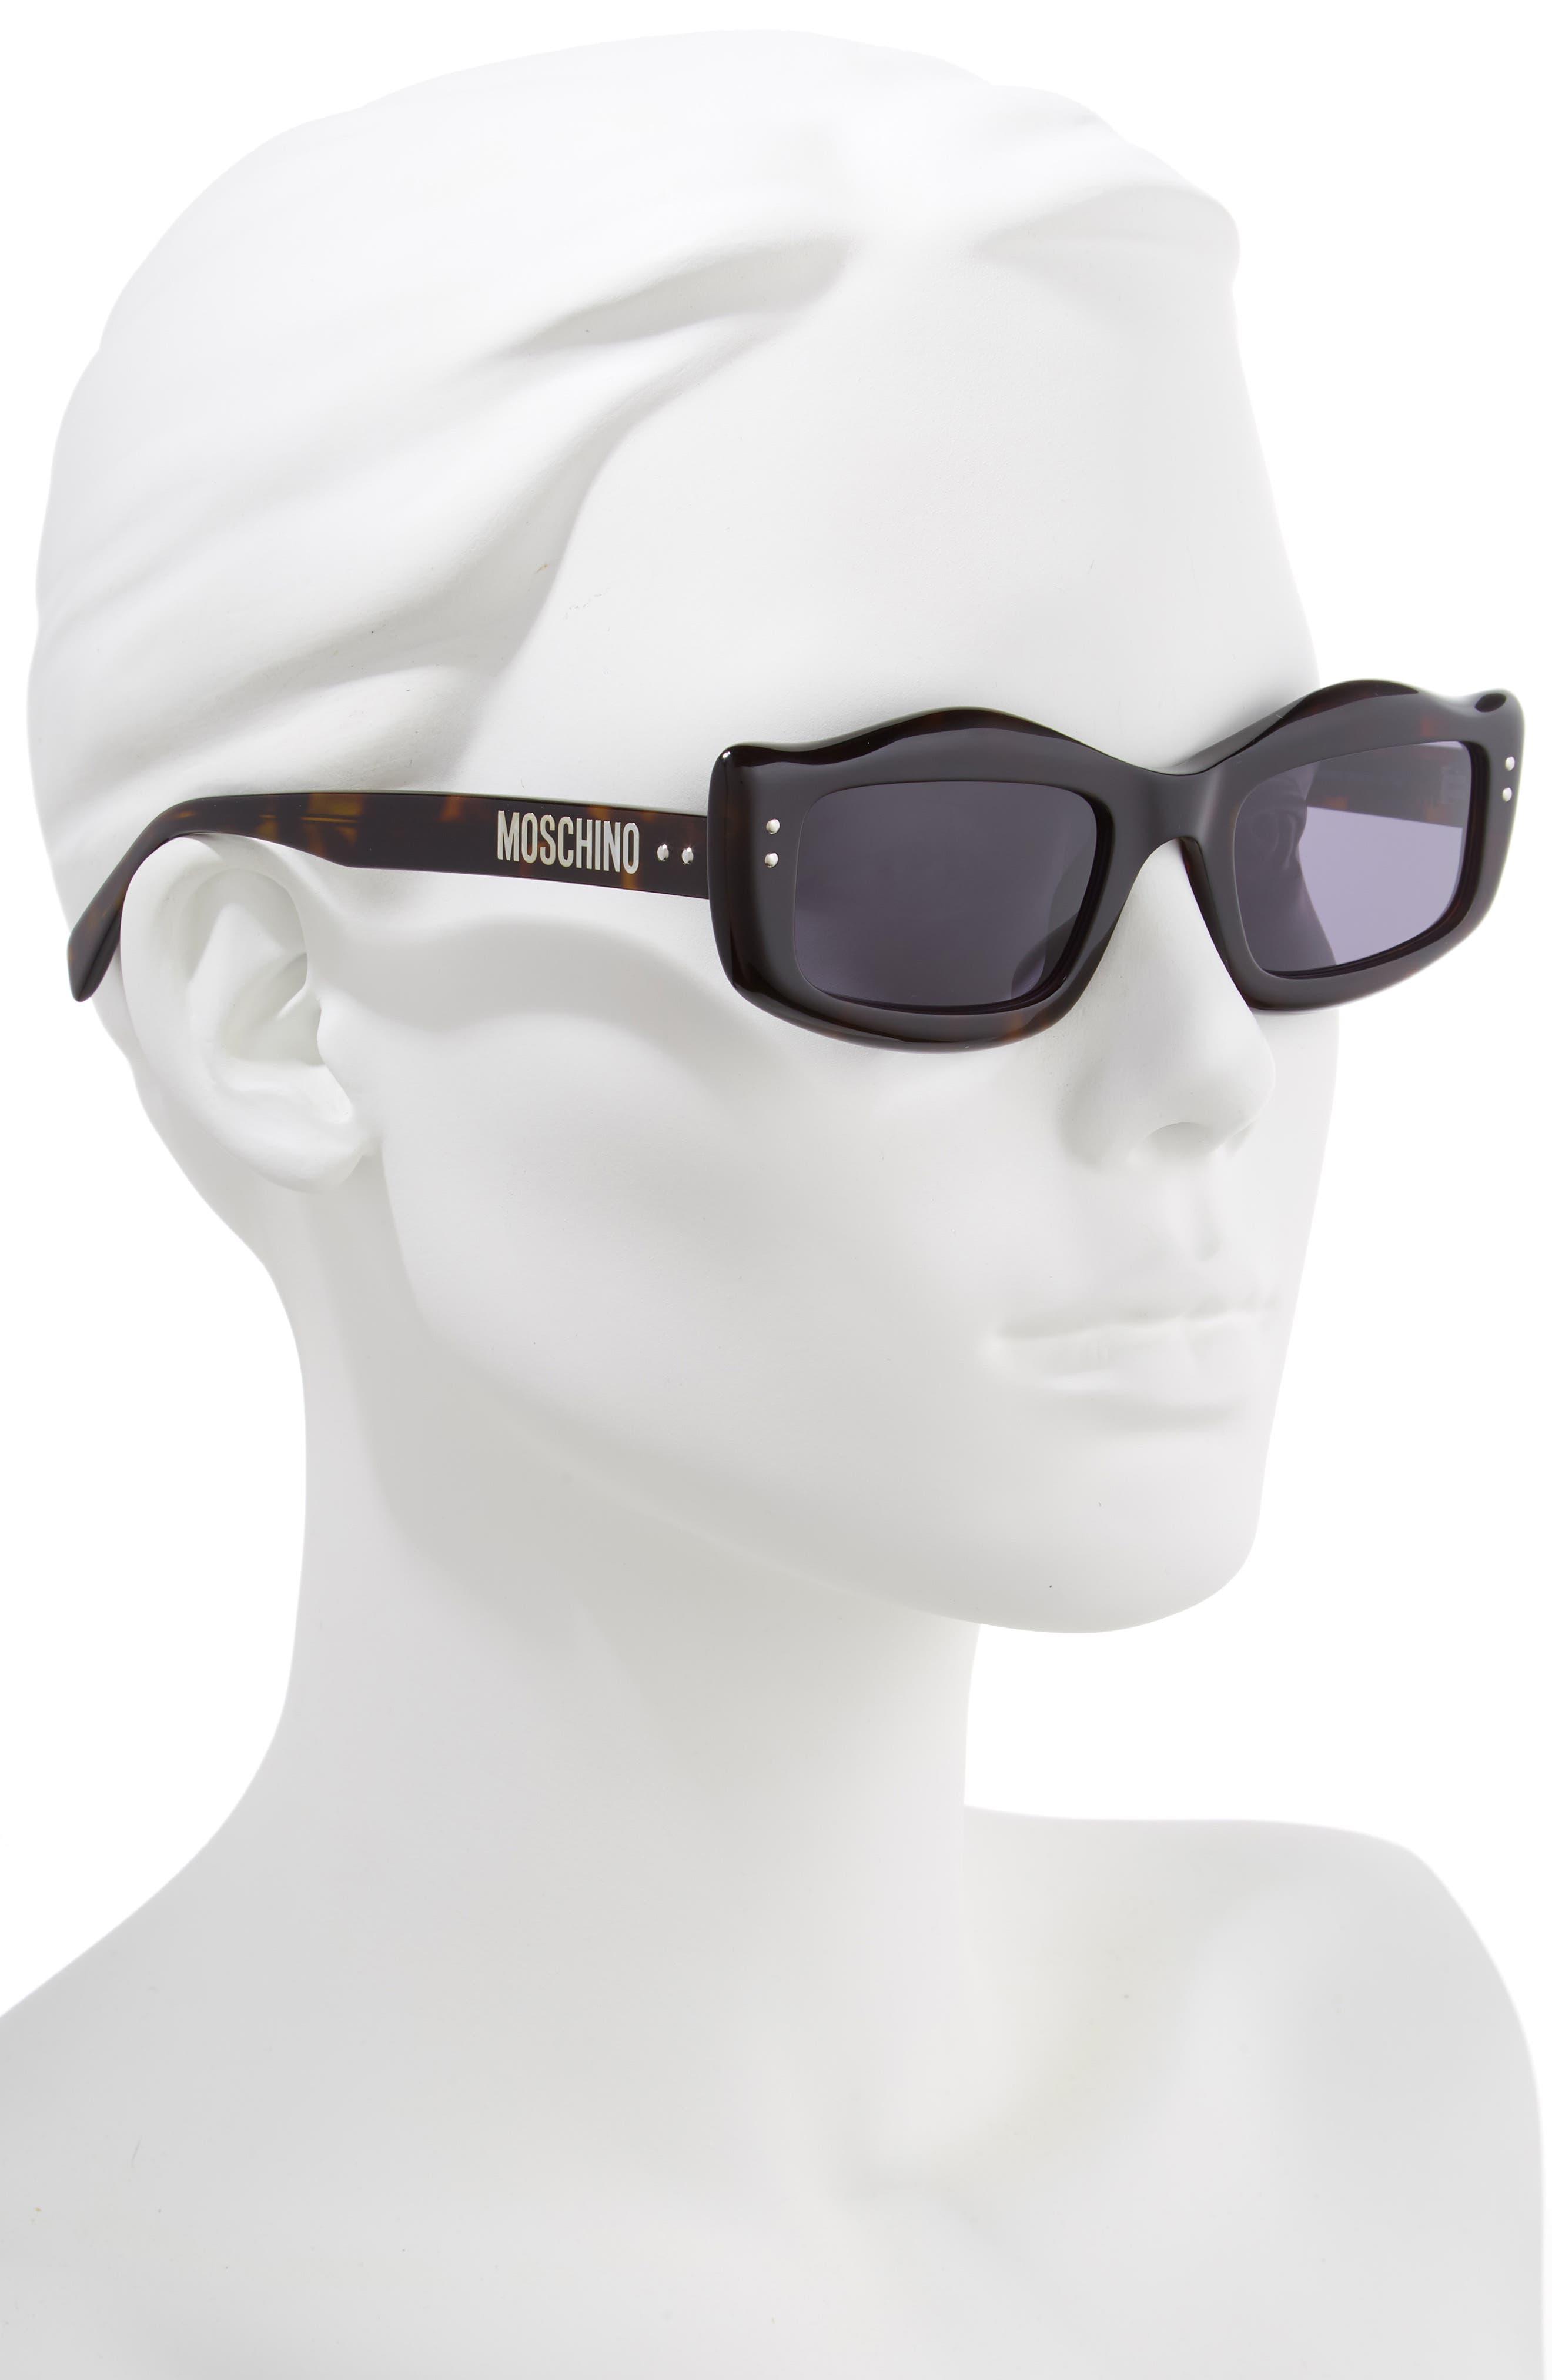 MOSCHINO, 51mm Rectangle Sunglasses, Alternate thumbnail 2, color, DARK HAVANA